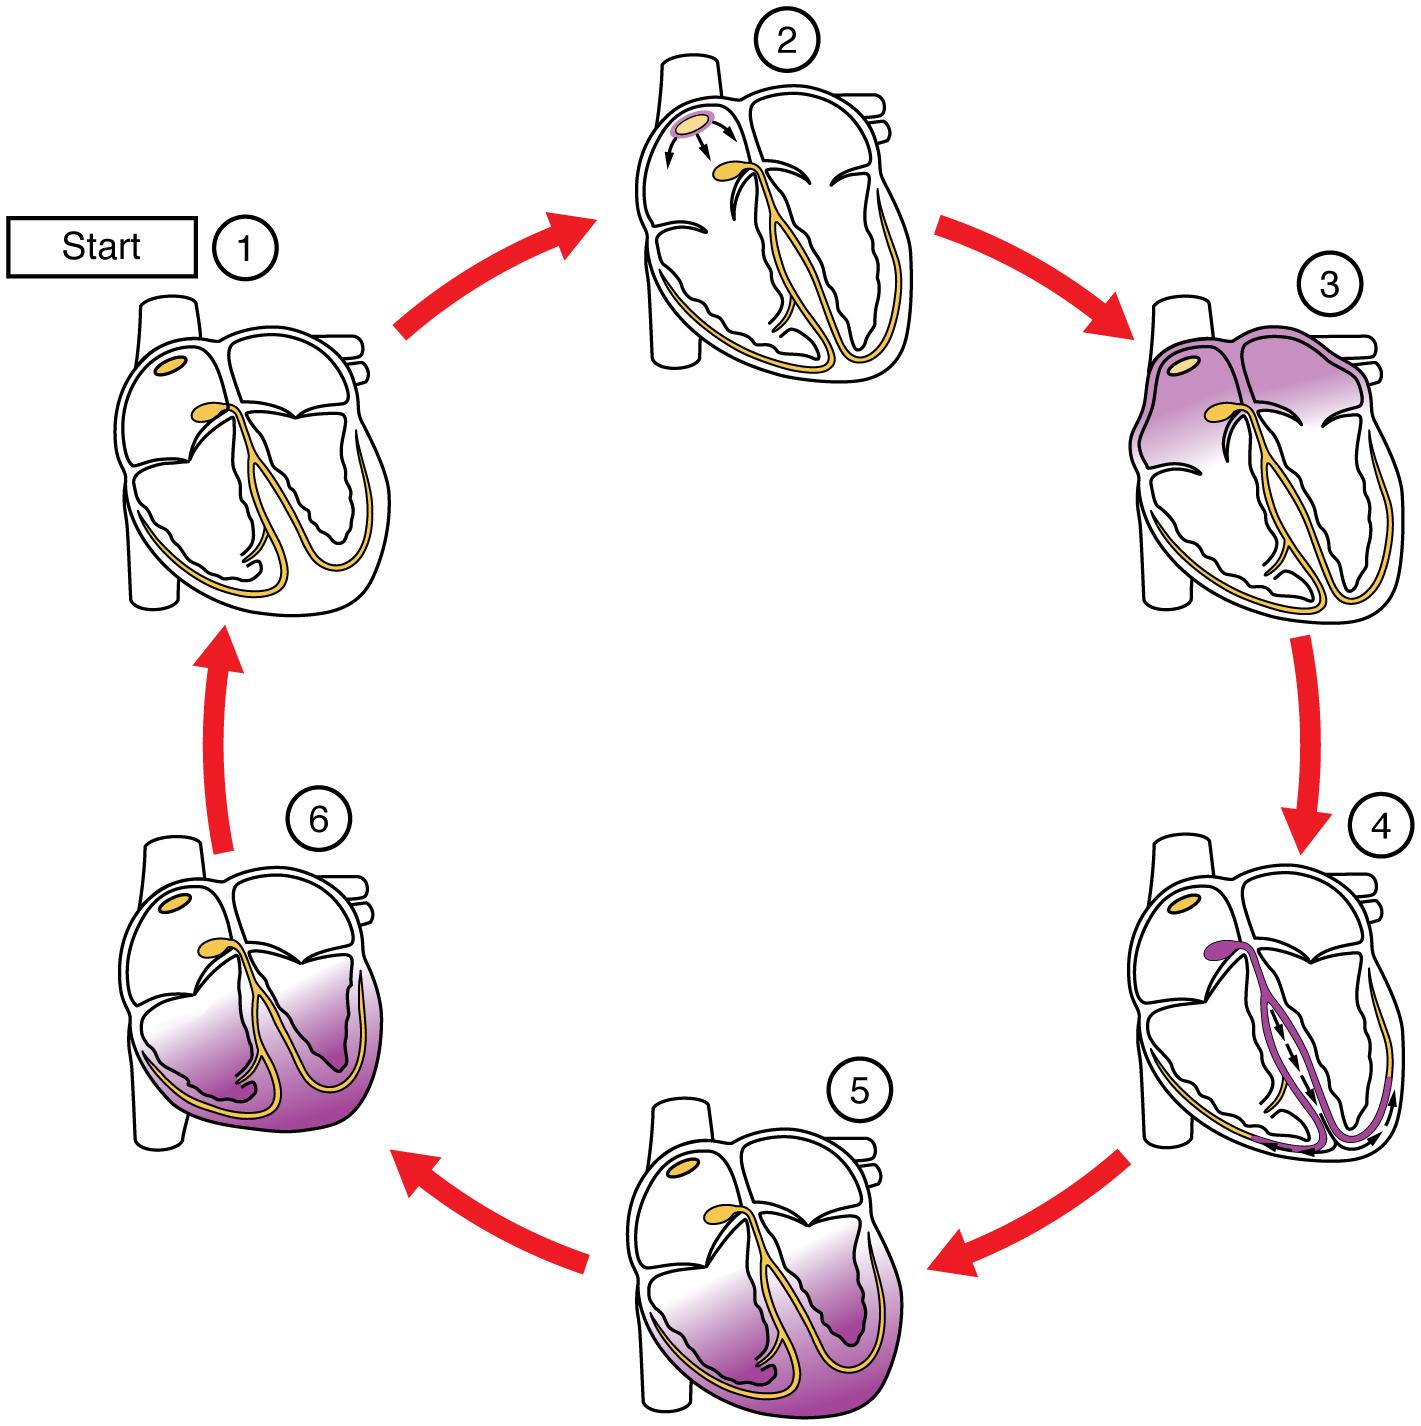 File:2019 Cardiac ConductionN.jpg - Wikimedia Commons